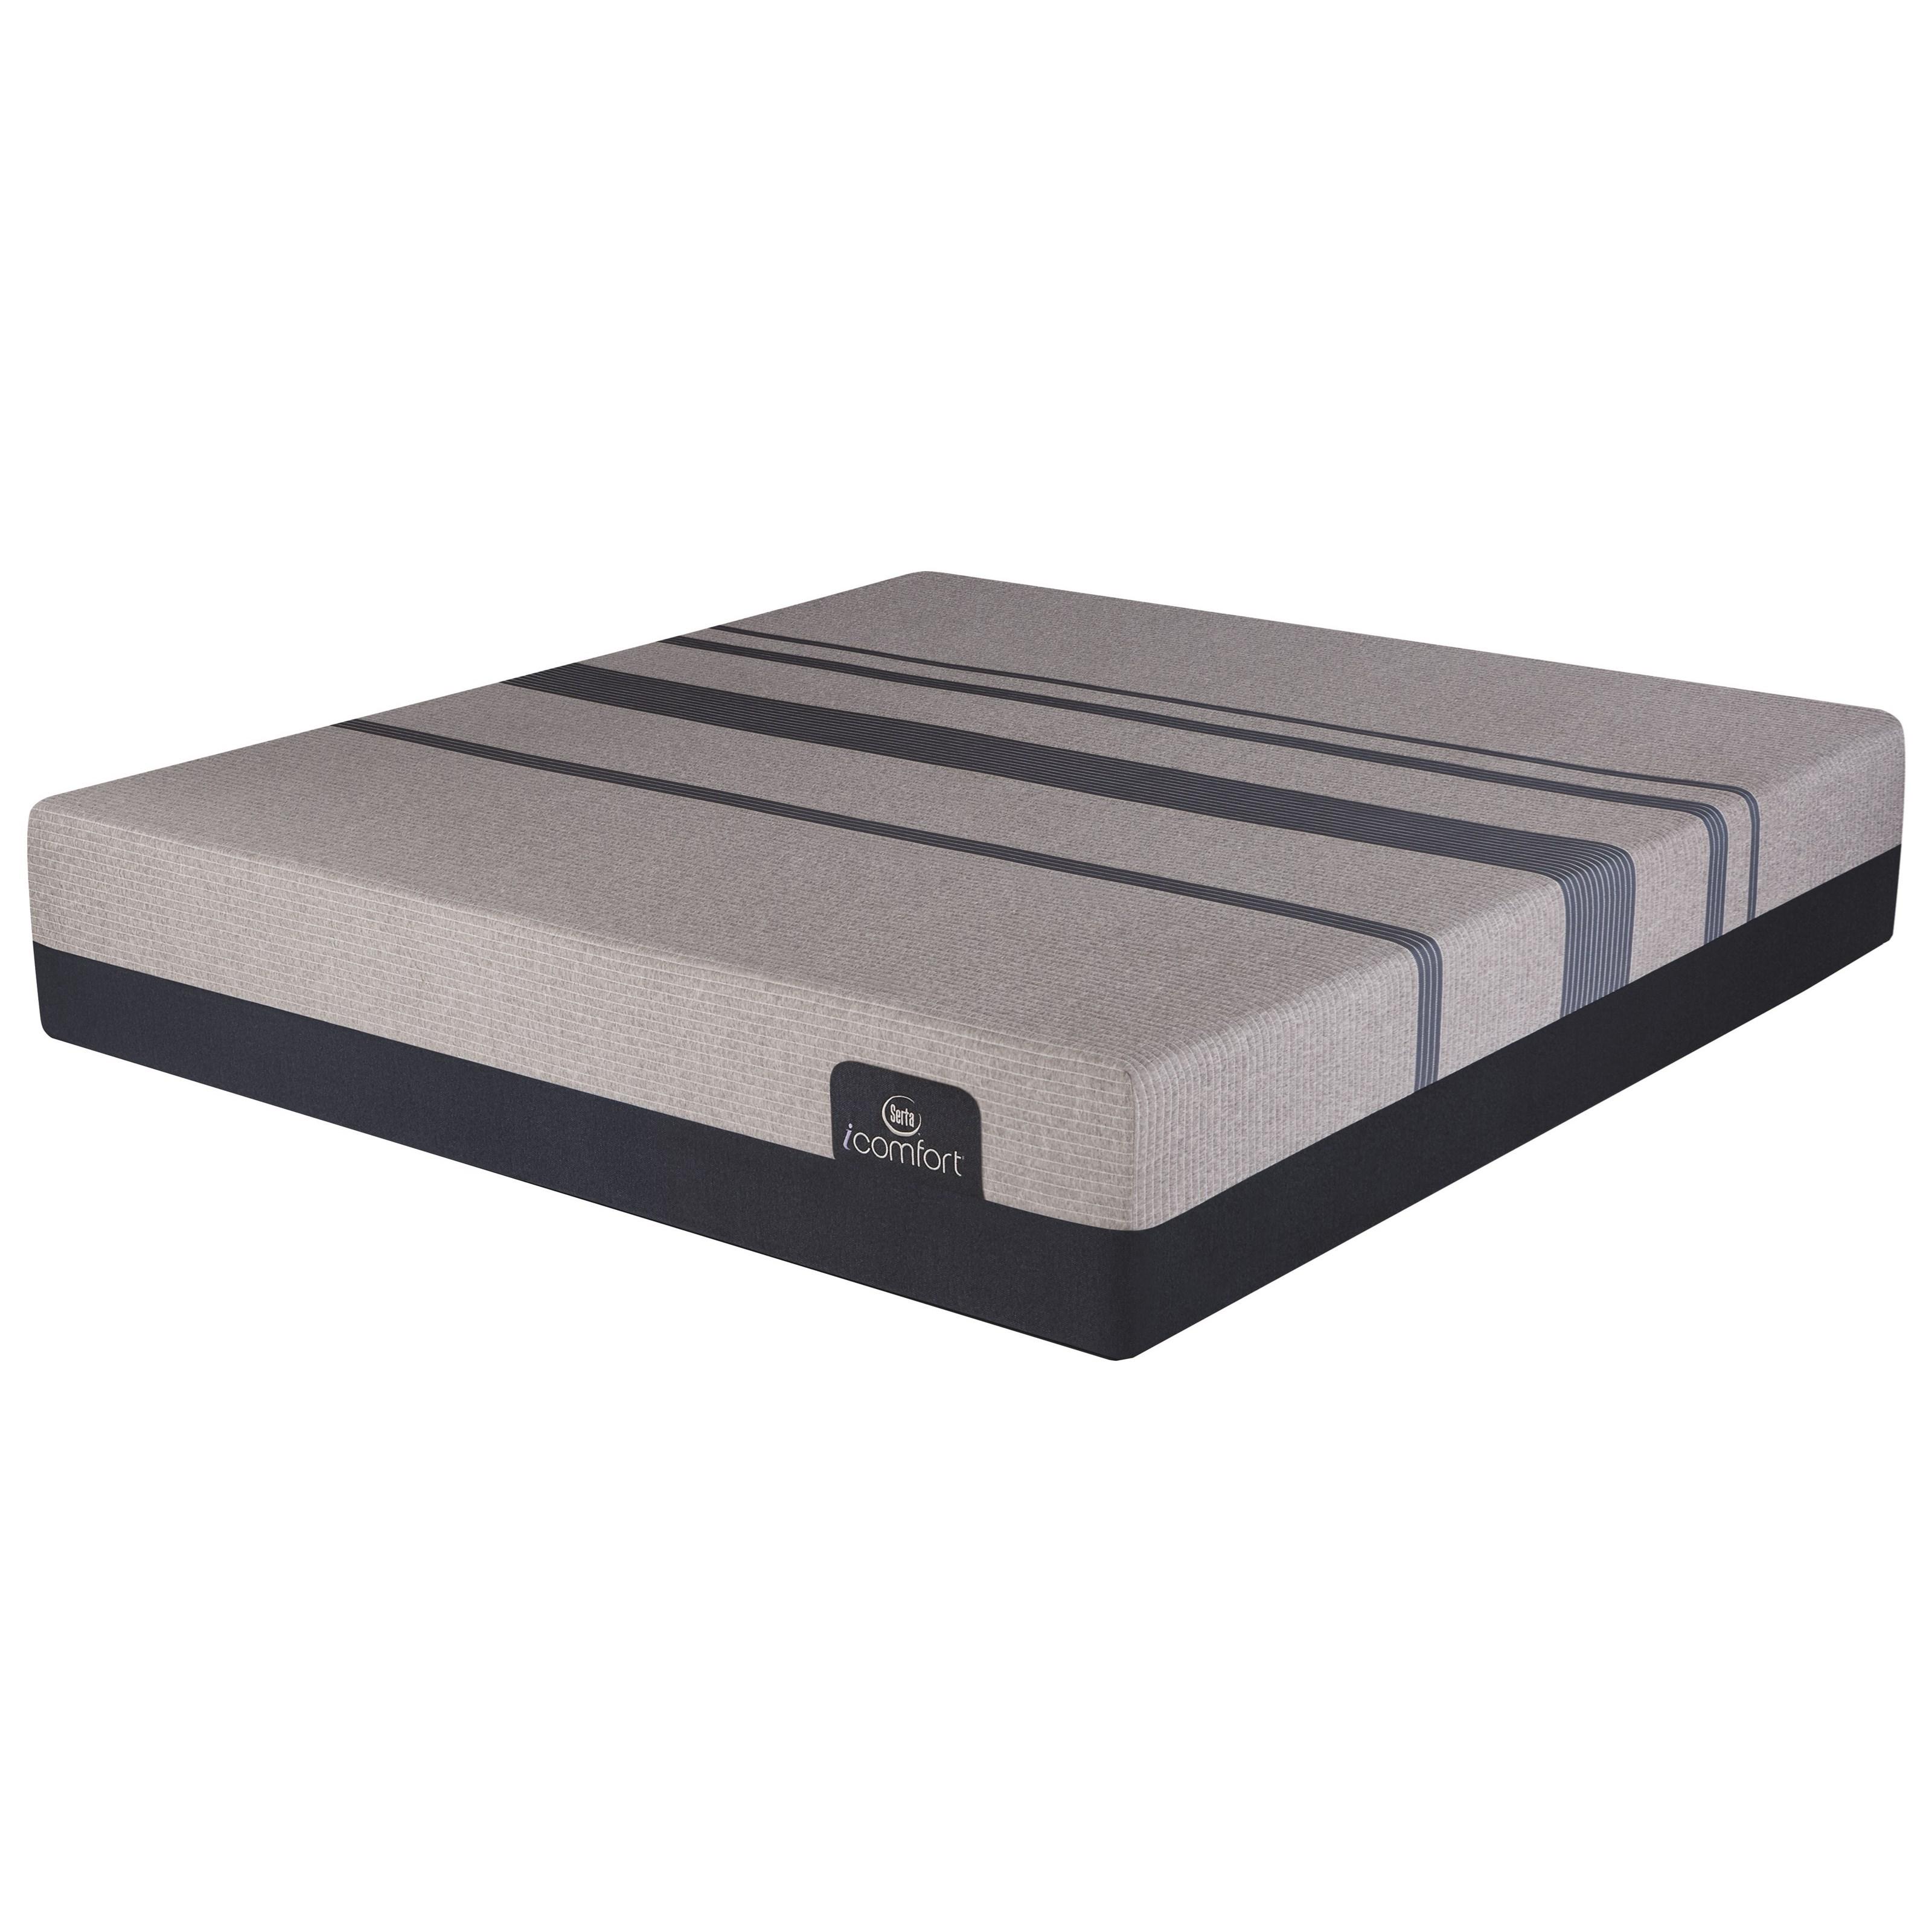 Serta iComfort Blue Max 5000 Elite Luxury Firm Queen Elite Lux Firm Gel Memory Foam Matt - Item Number: 500801048-1050